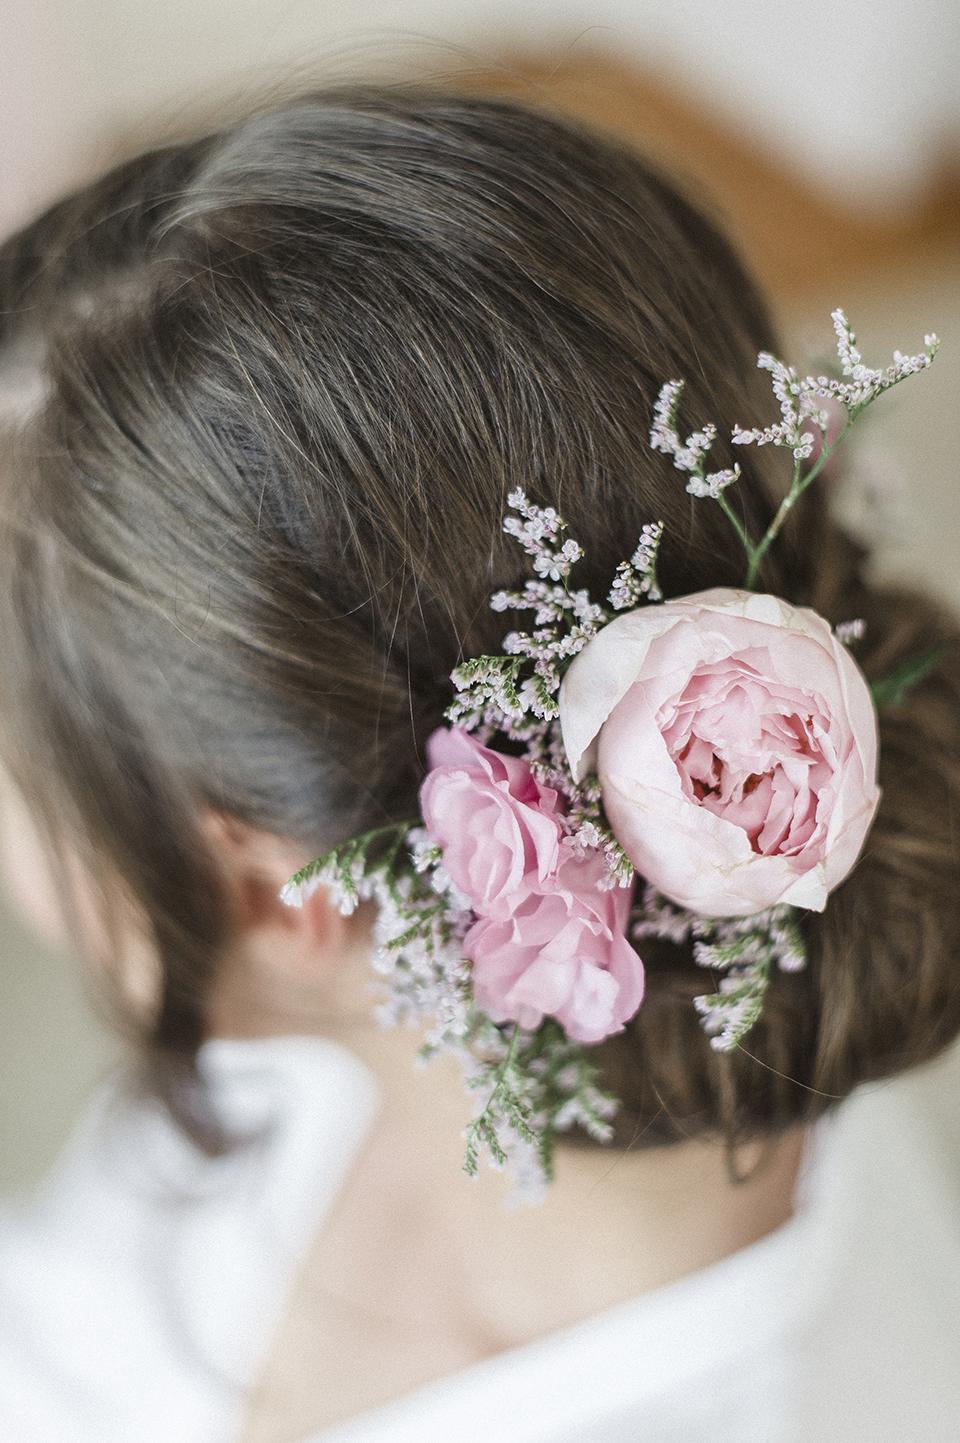 RyanParker_WeddingPhotographer_FineArt_CapeTown_BonaDea_Hermanus_S&A_DSC_1410.jpg